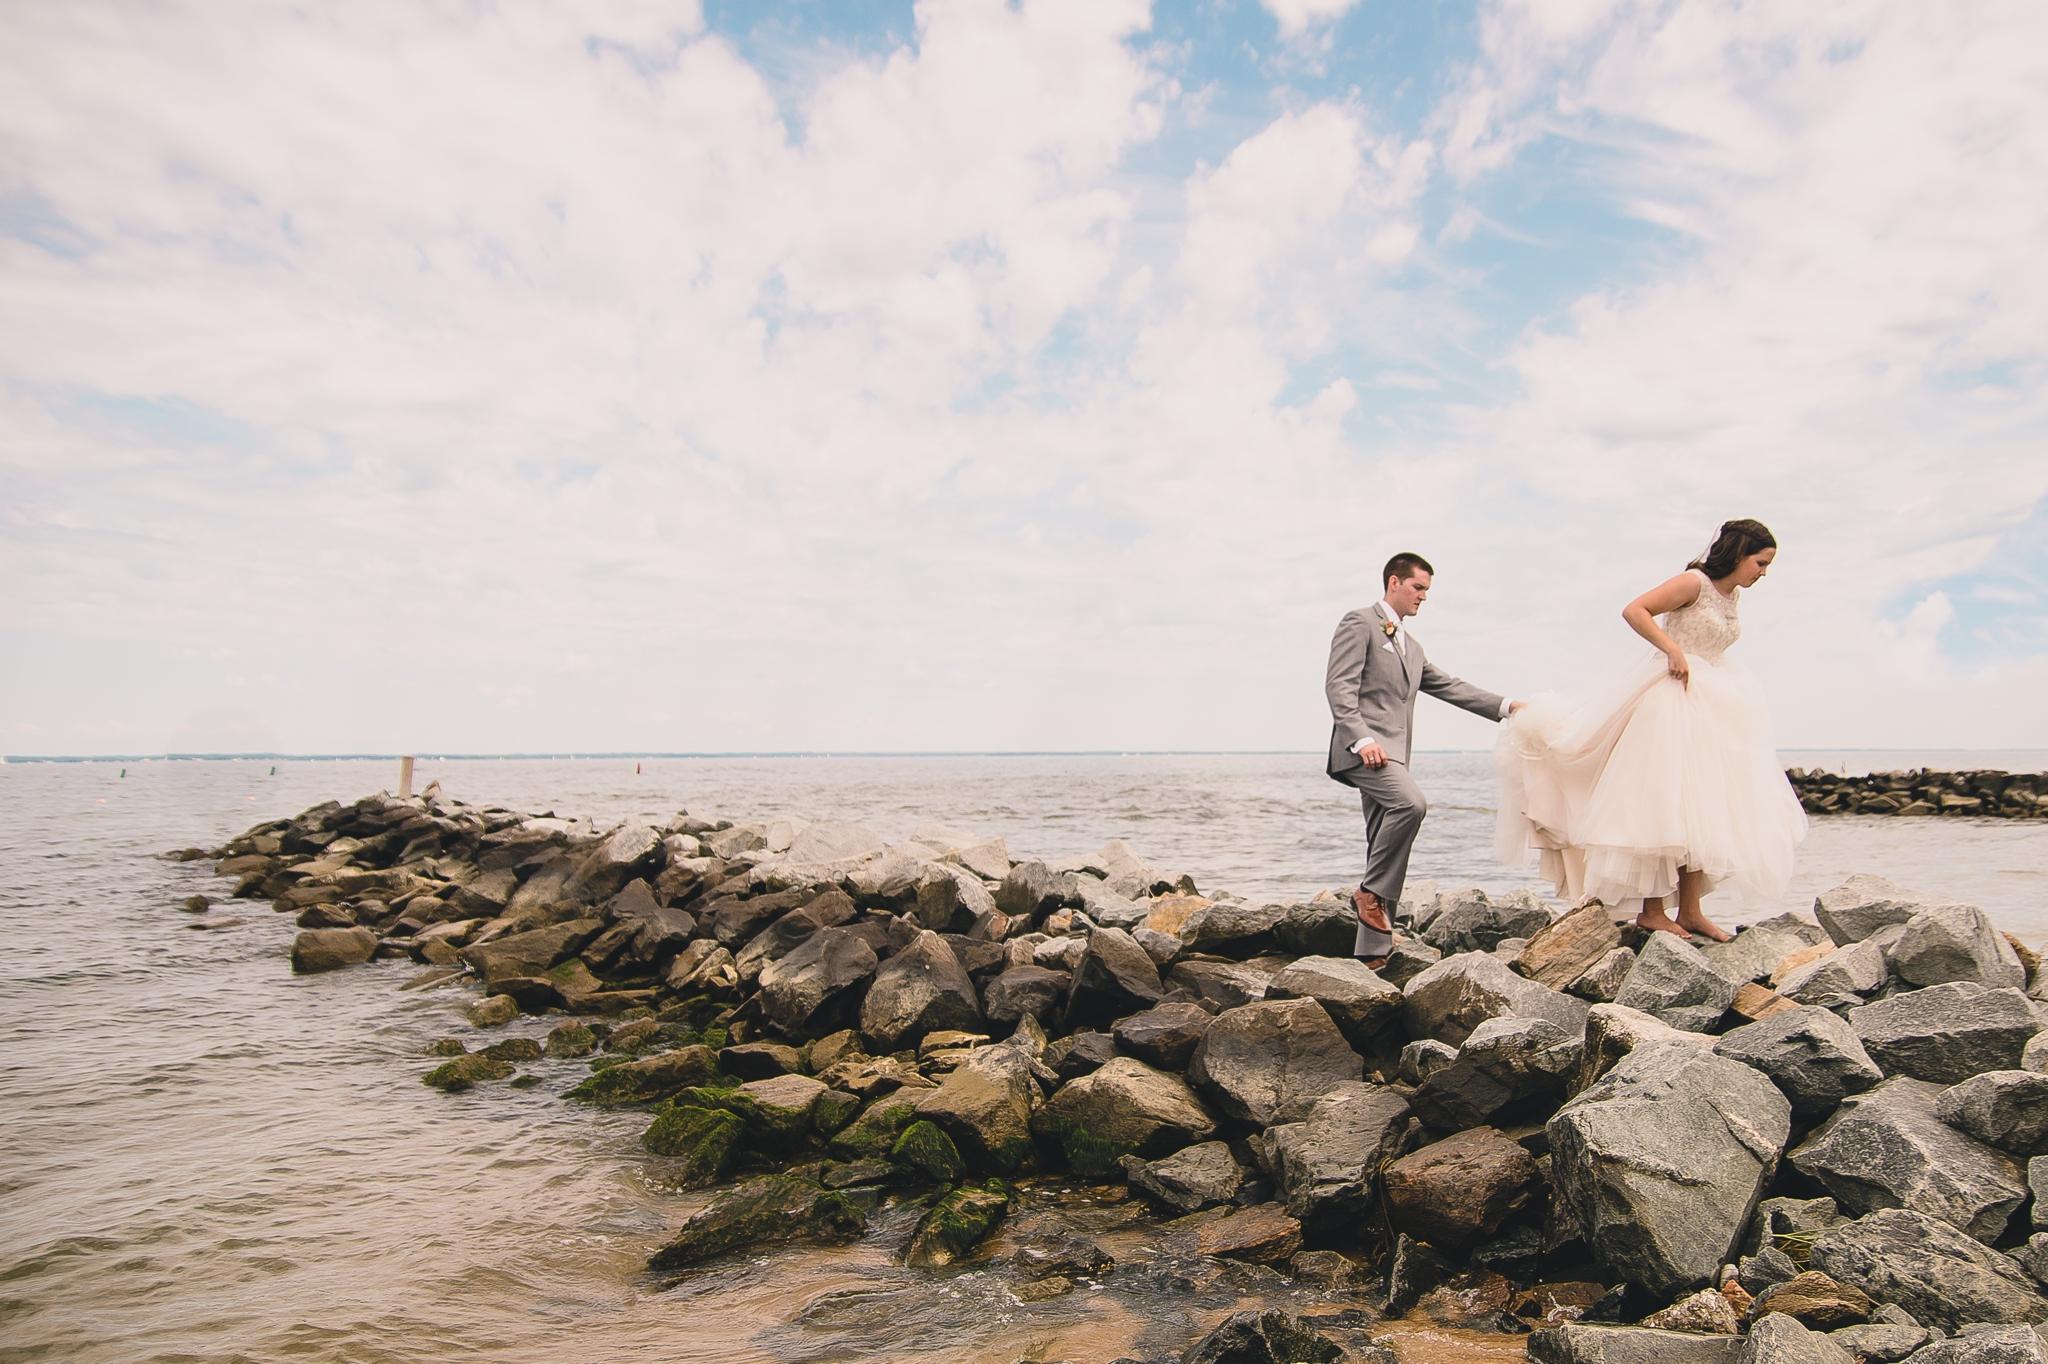 chesapeake bay wedding at silver swan bayside on kent island maryland by jonathan hannah photography